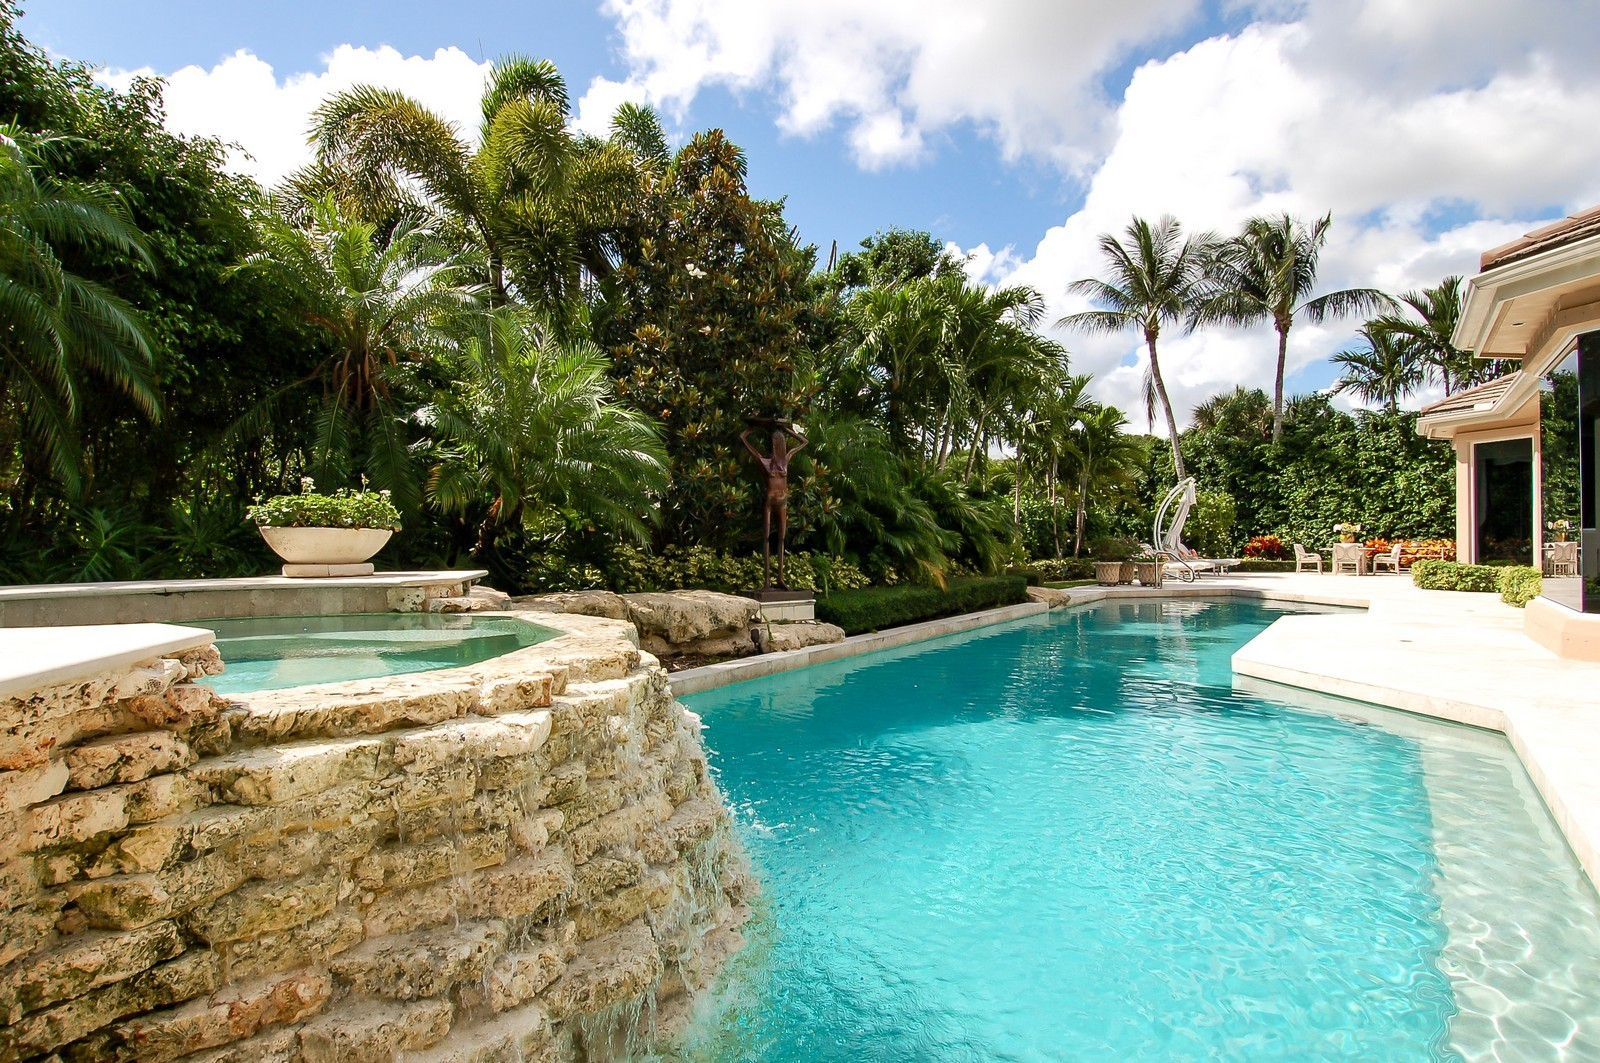 Real Estate Photography - 19674 OakbrookCourt, Boca Raton, FL, 33434 - Pool